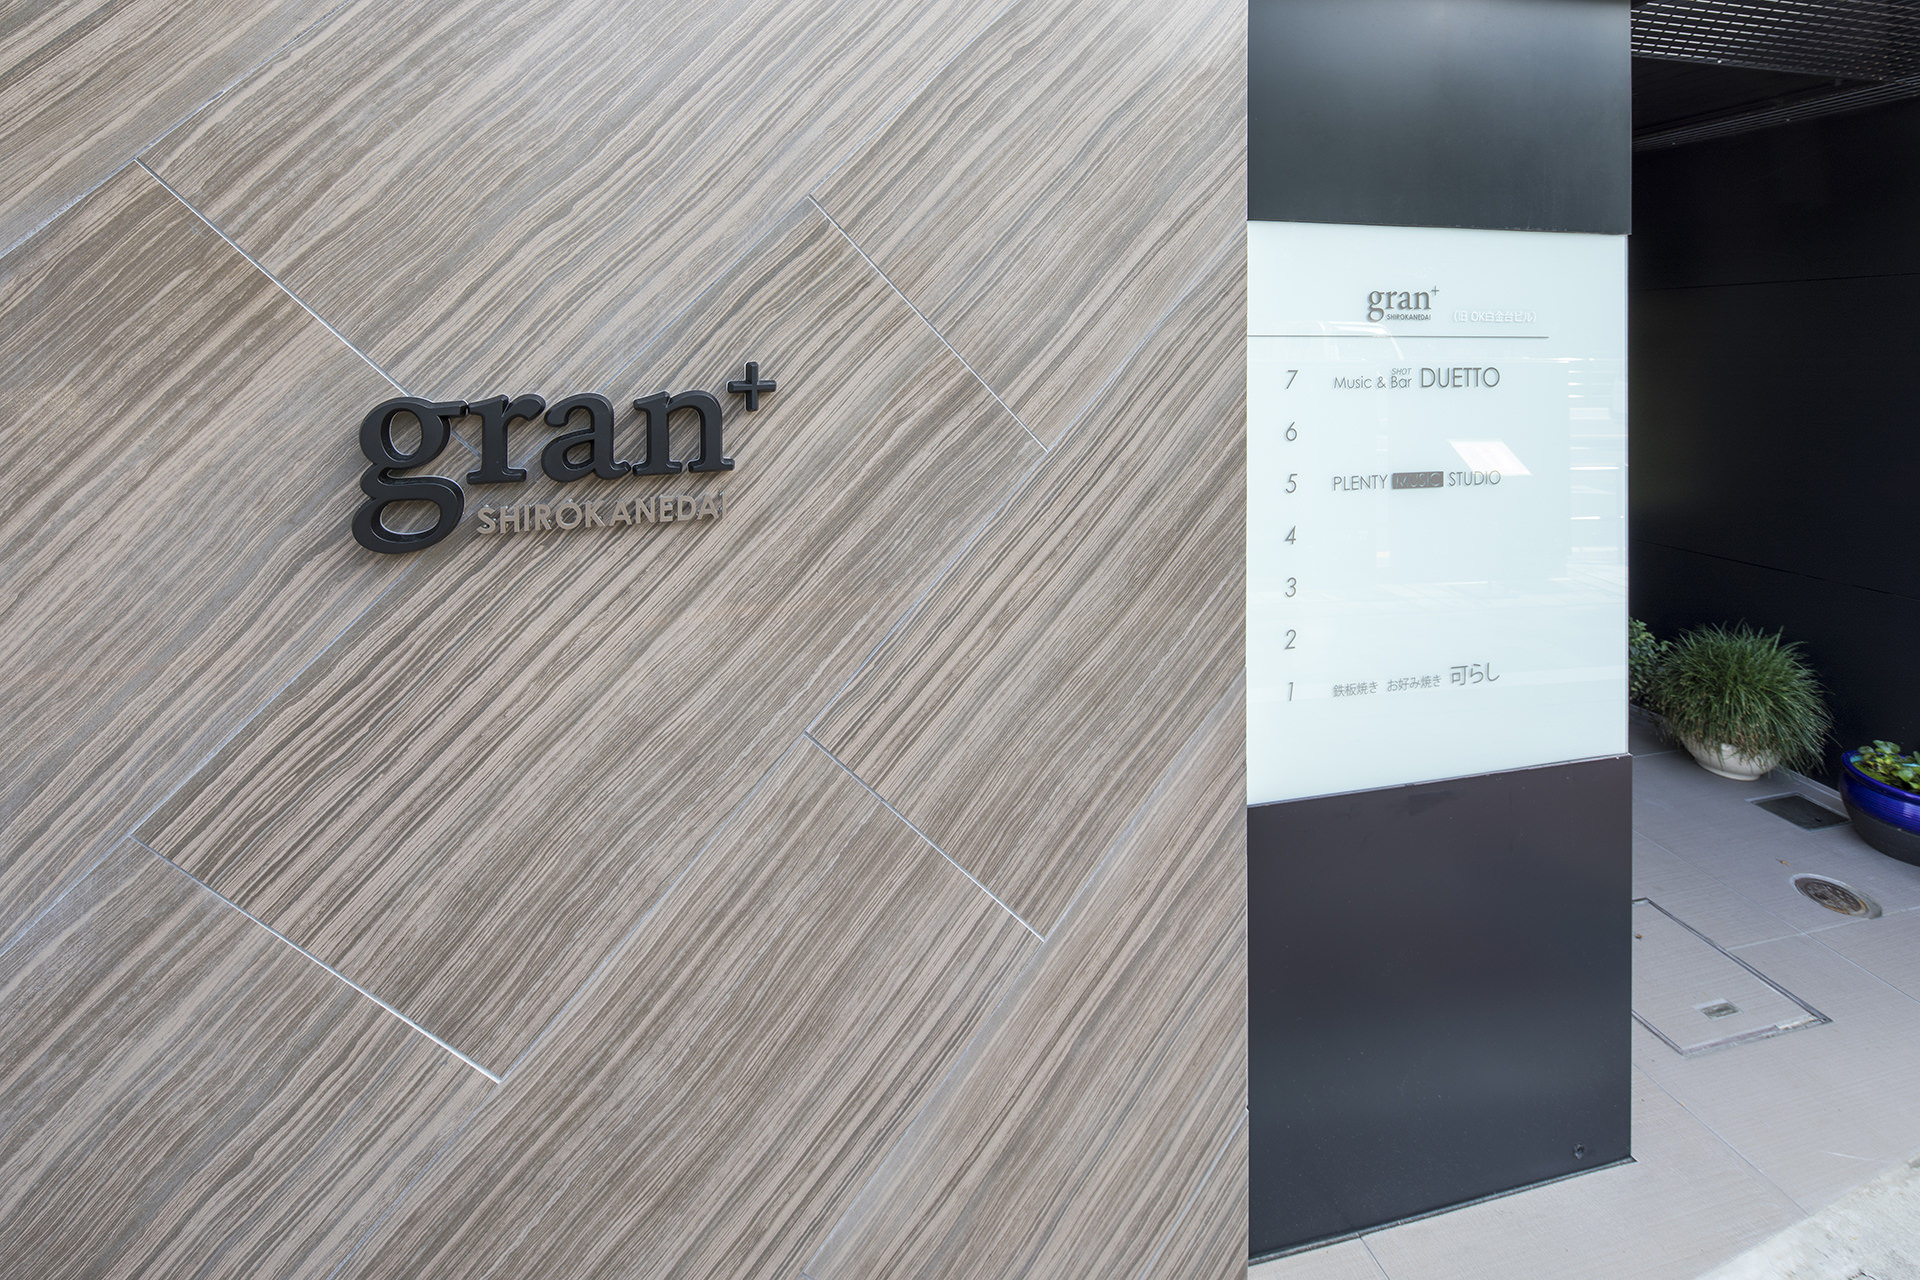 gran+ SHIROKANEDAI イメージ2 撮影:東涌写真事務所・東涌宏和